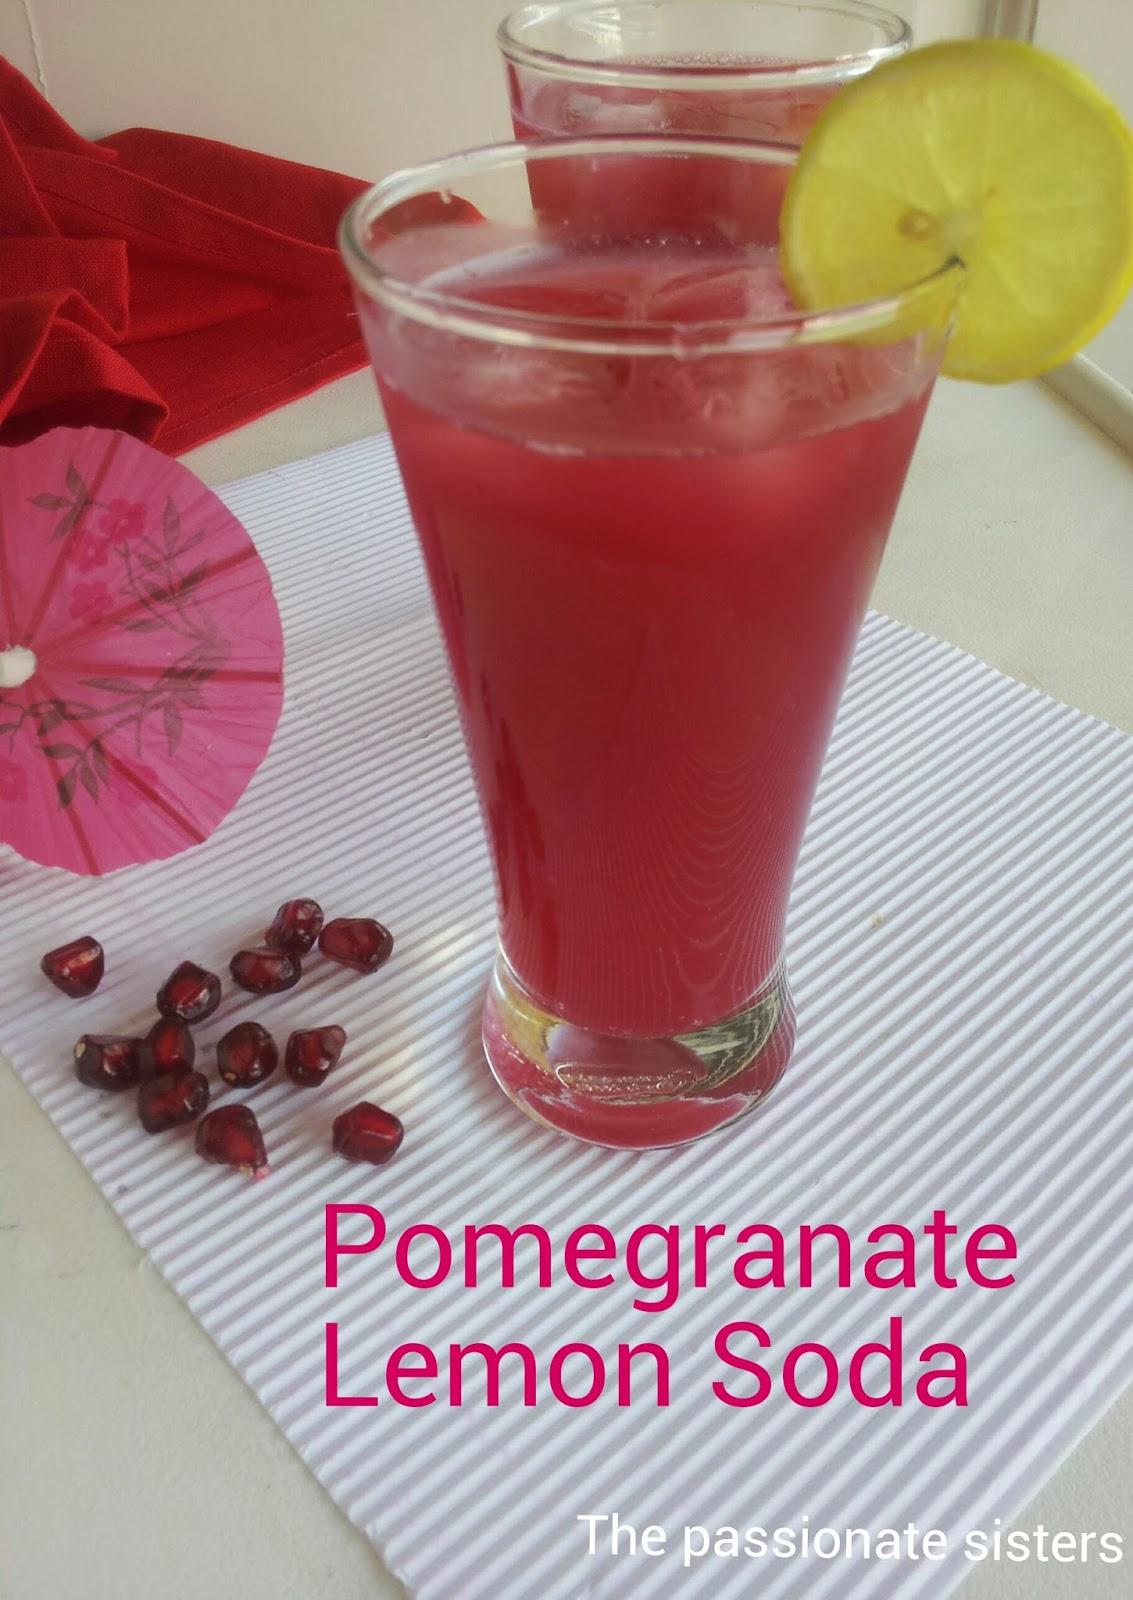 ... drink as pomegranate lemon paneer soda as i used paneer soda in this